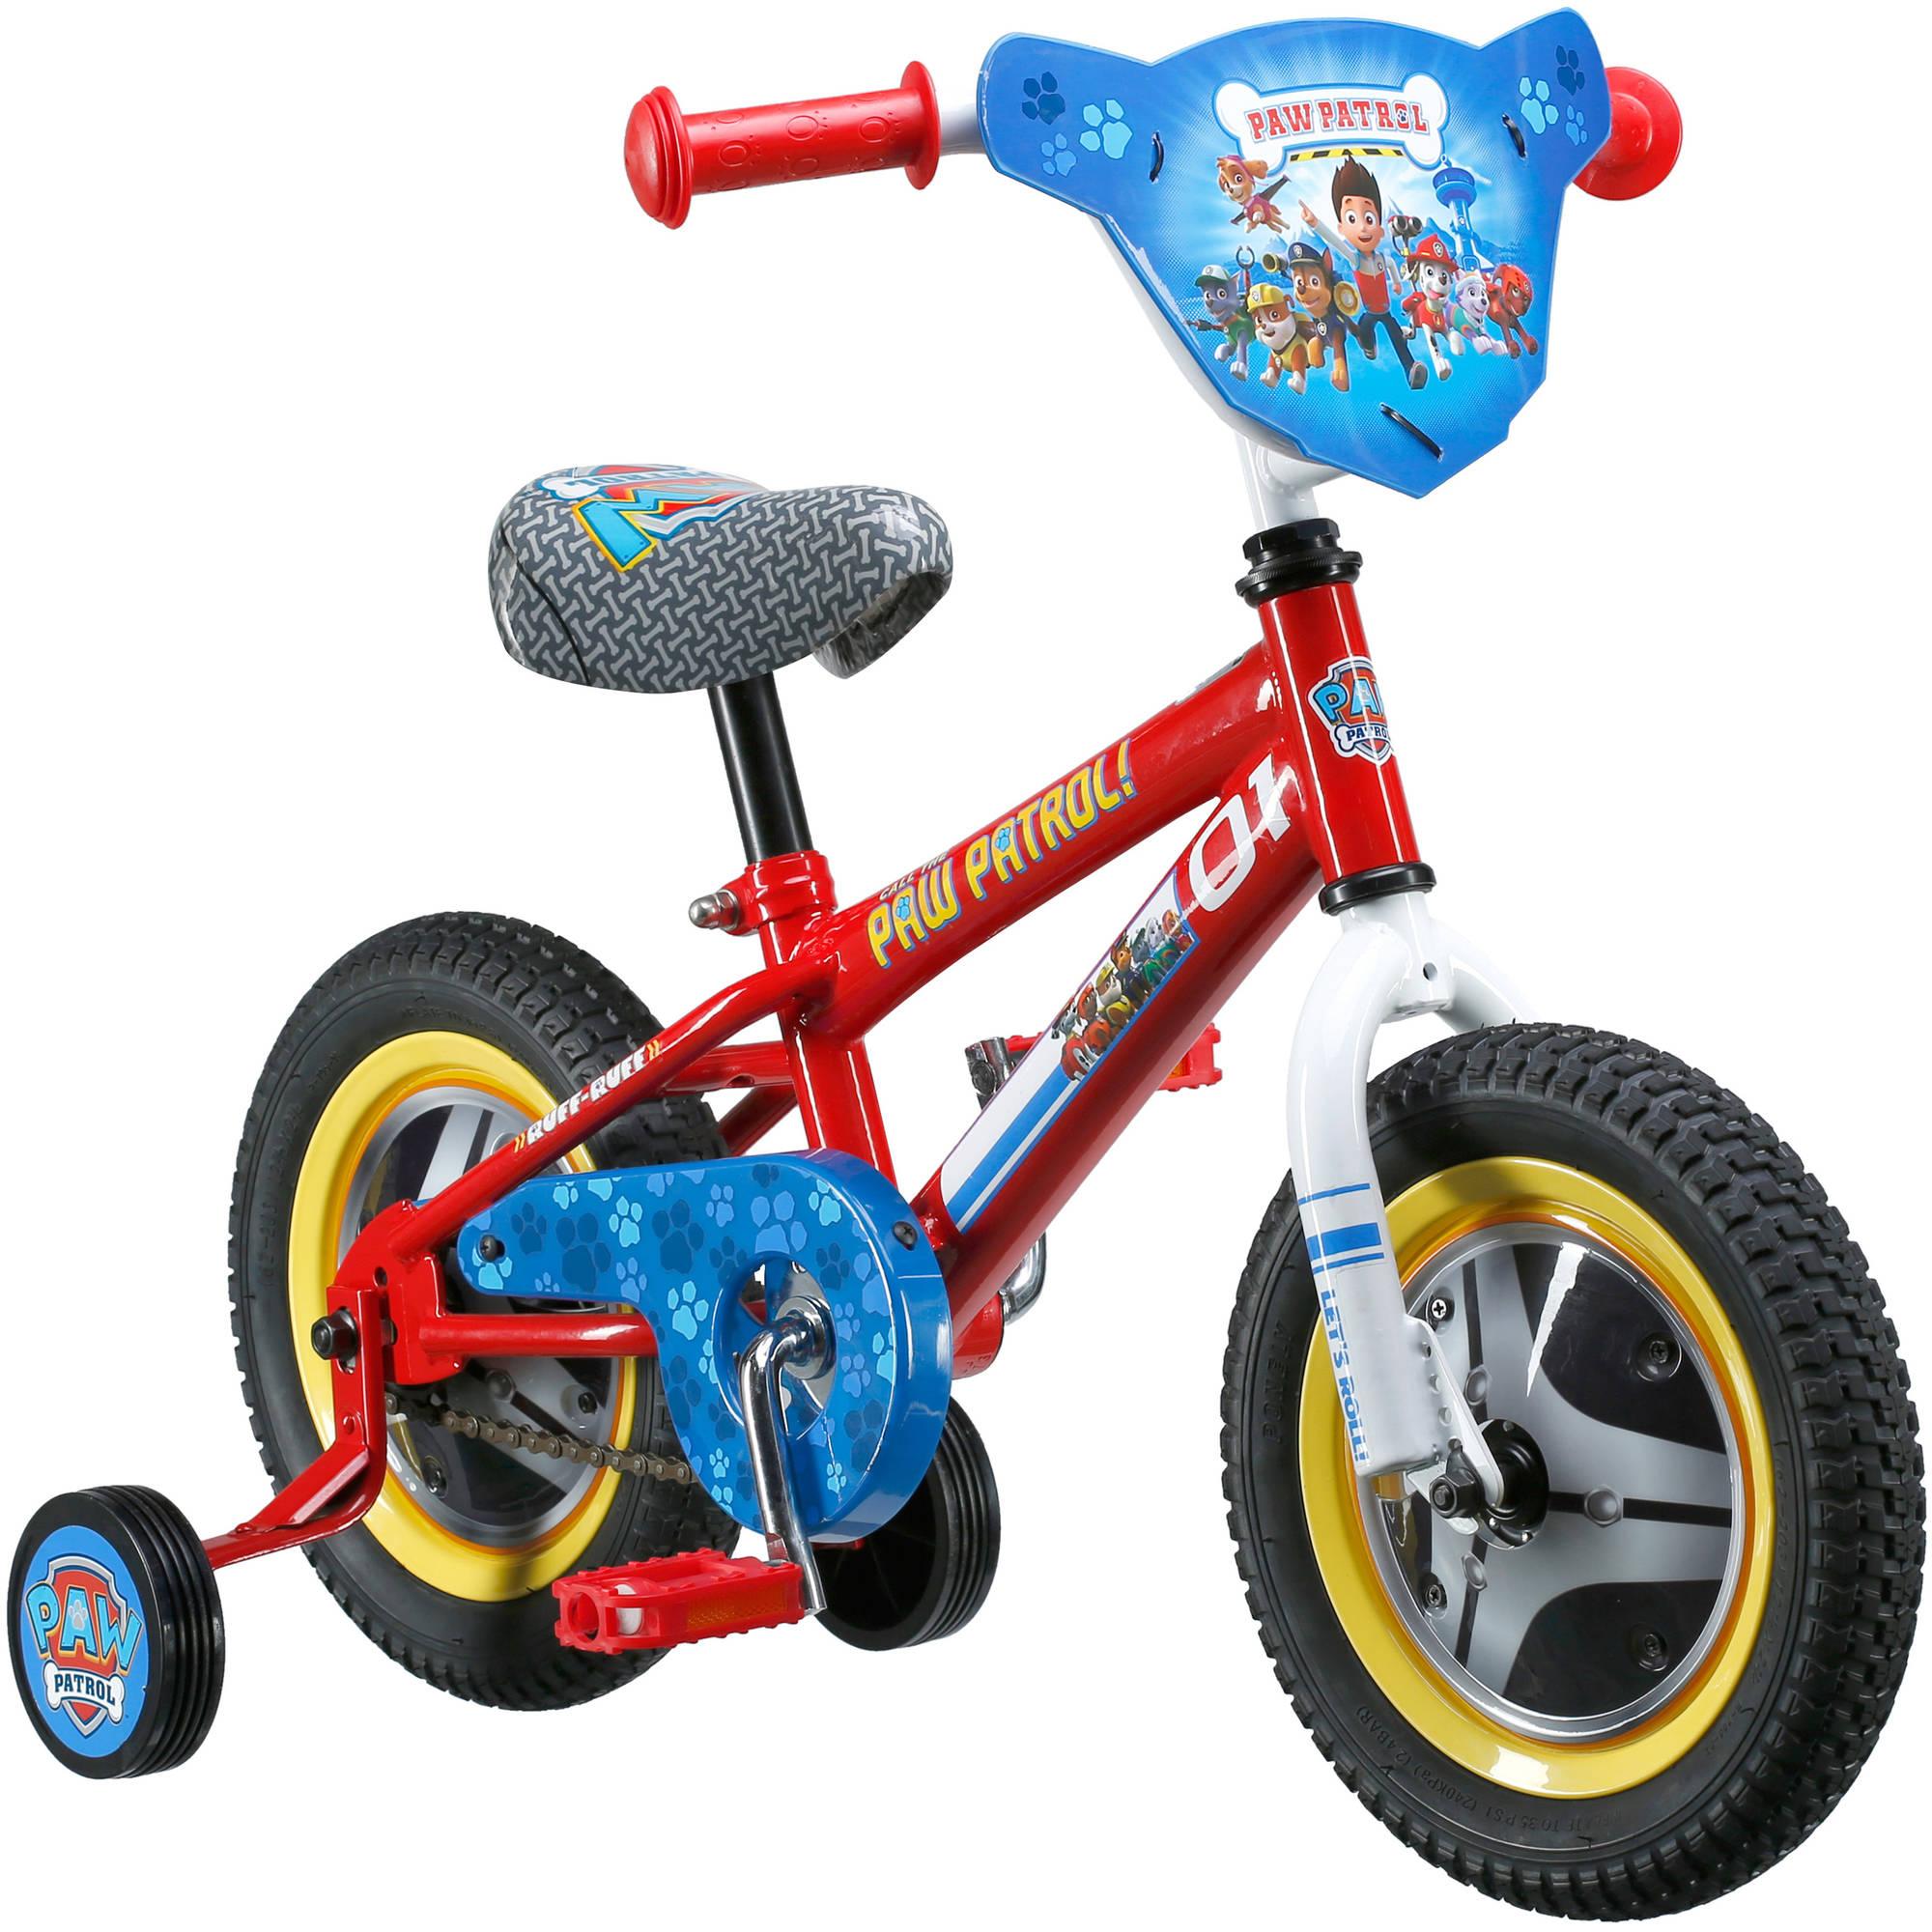 f6b85efb663 Paw Patrol Nickelodeon Kids Bicycle 12